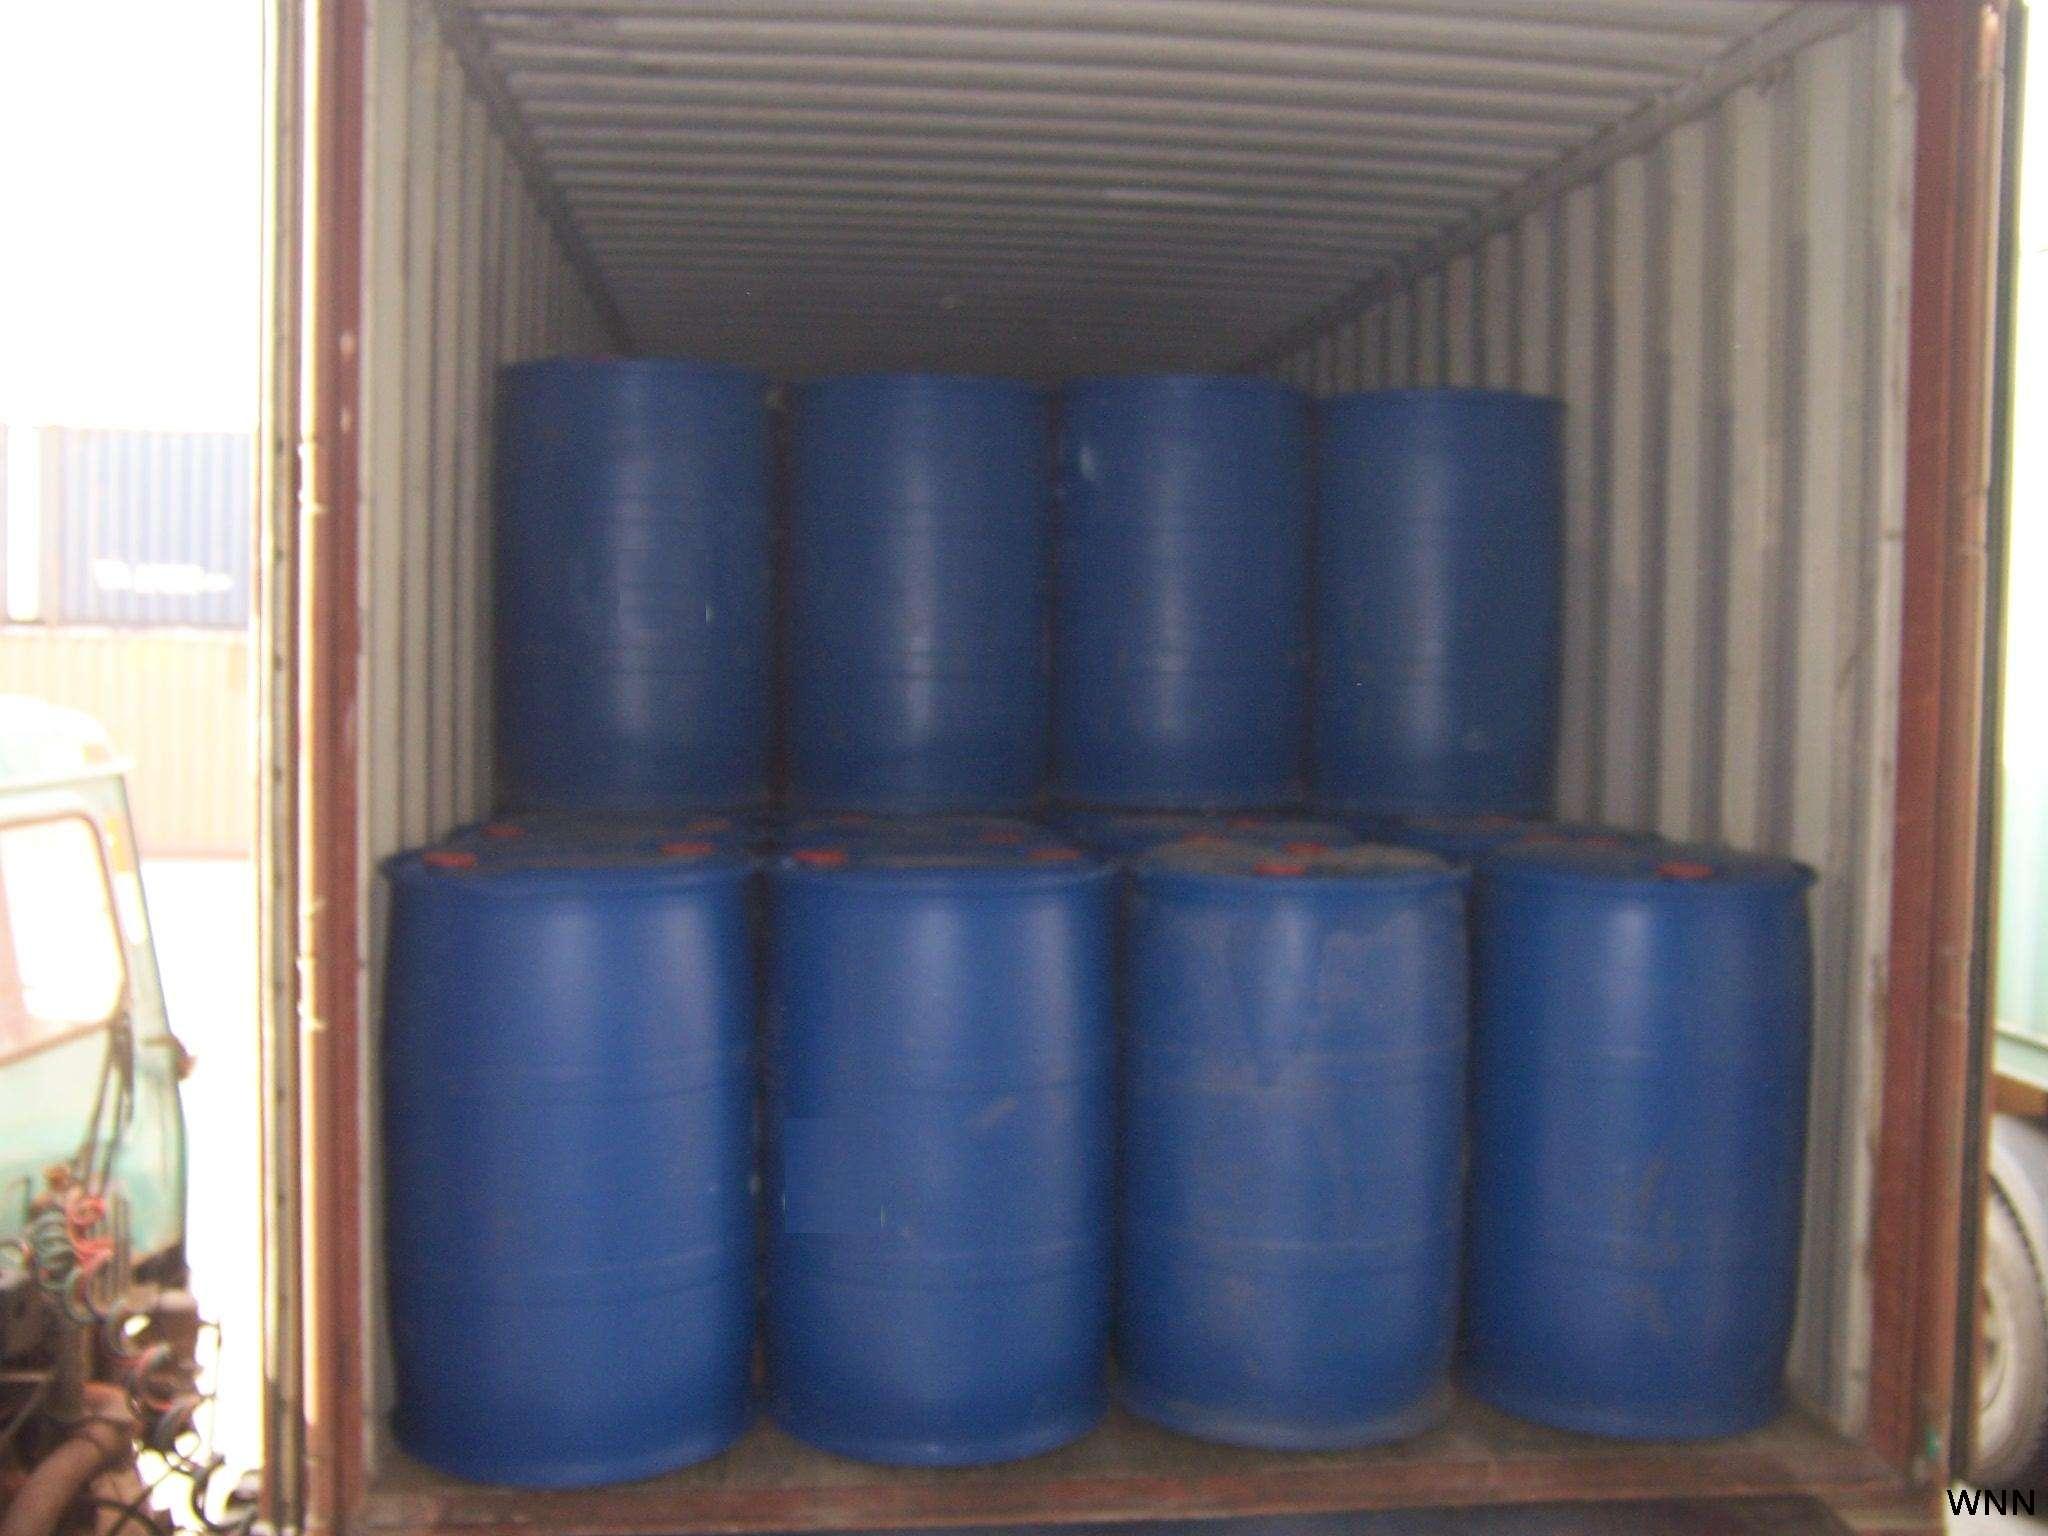 Sodium polysulfide